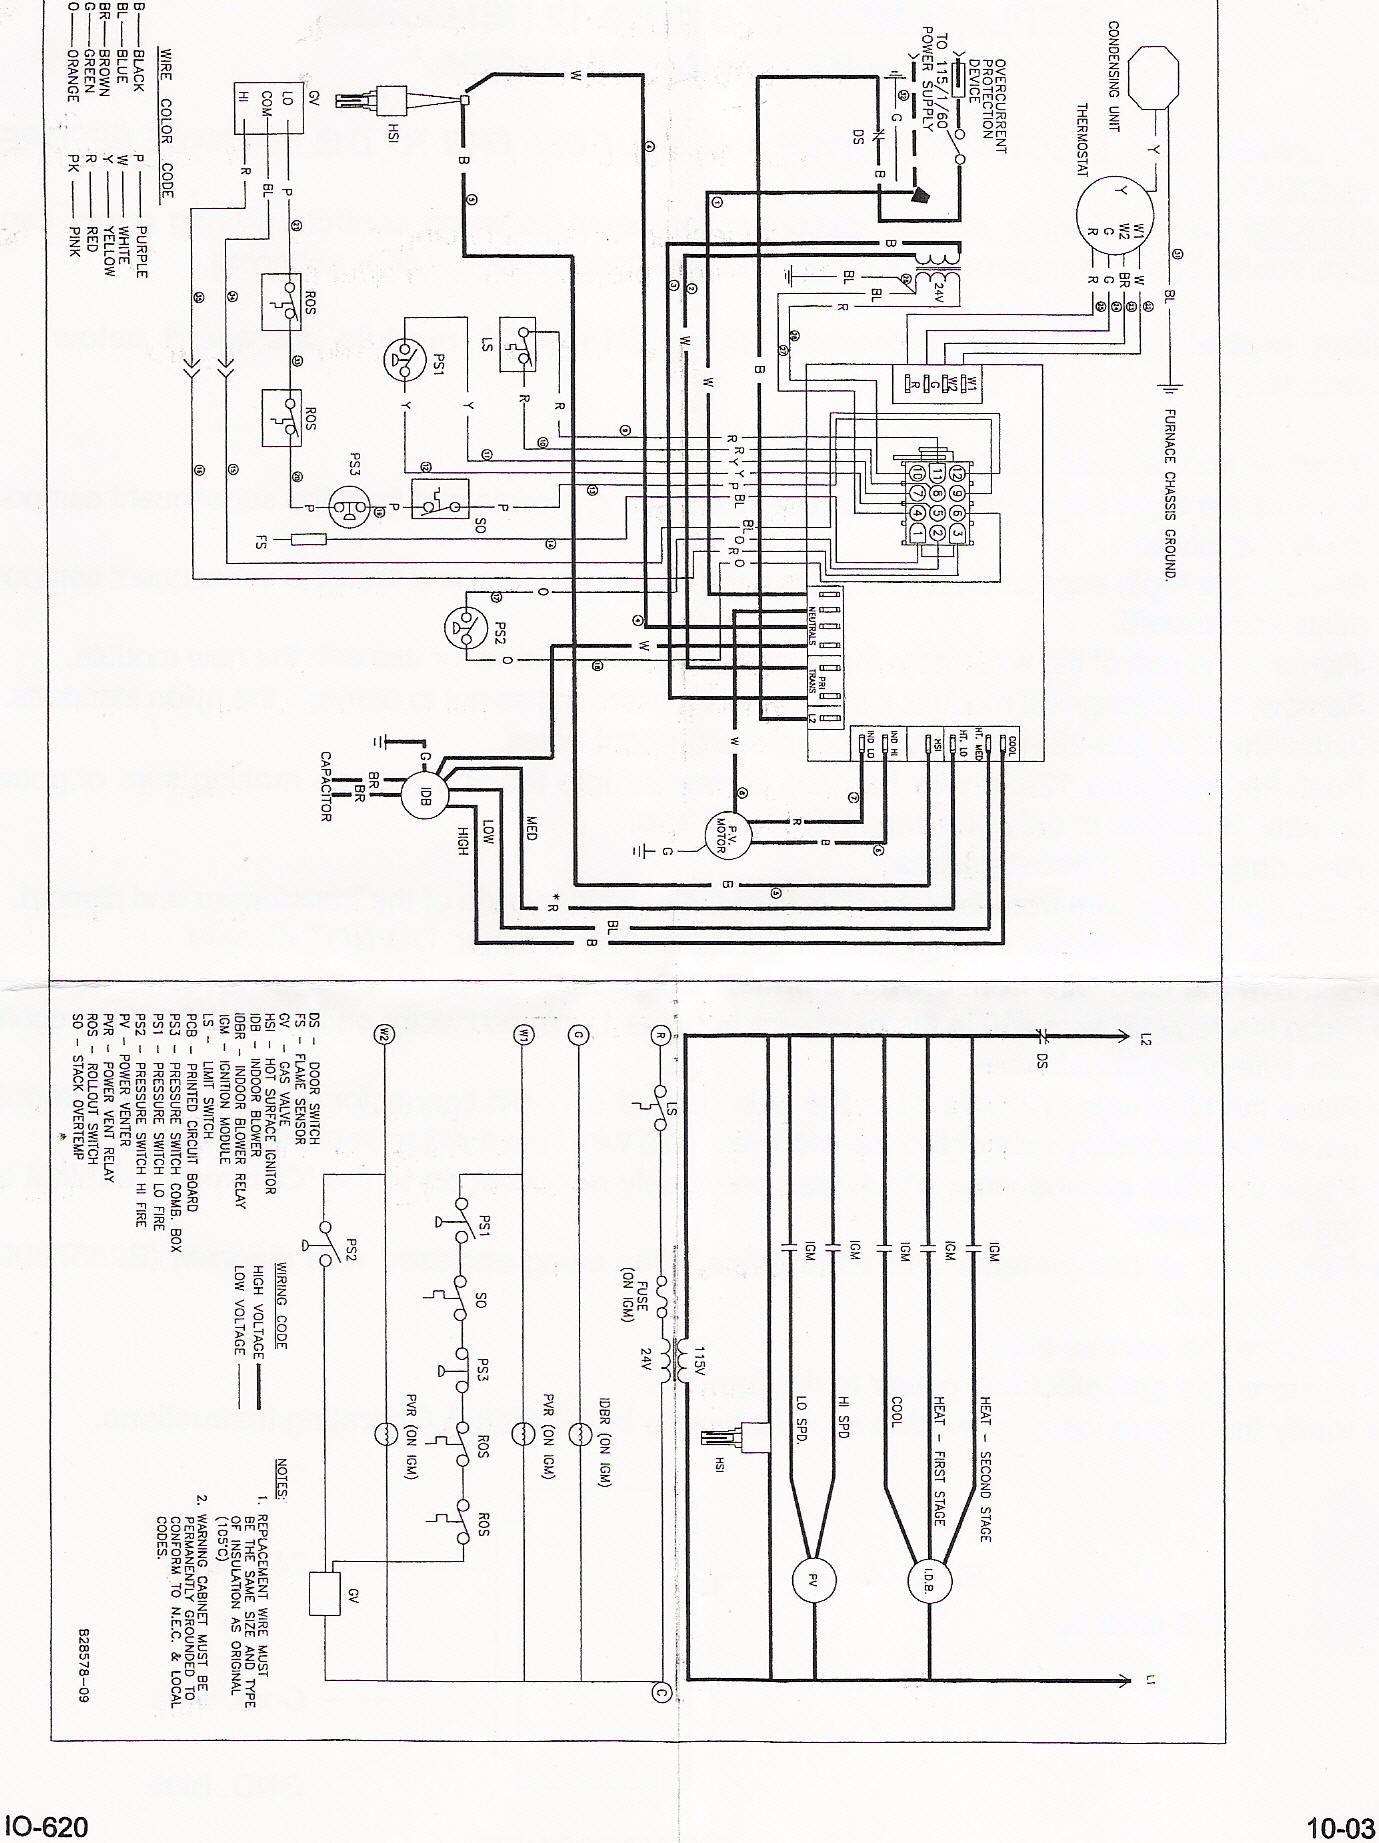 Tr200 Wiring Diagram Content Resource Of Xl500r Trane Heat Pump Defrost Trusted Diagrams U2022 Rh Tutu Helper Co Toshiba